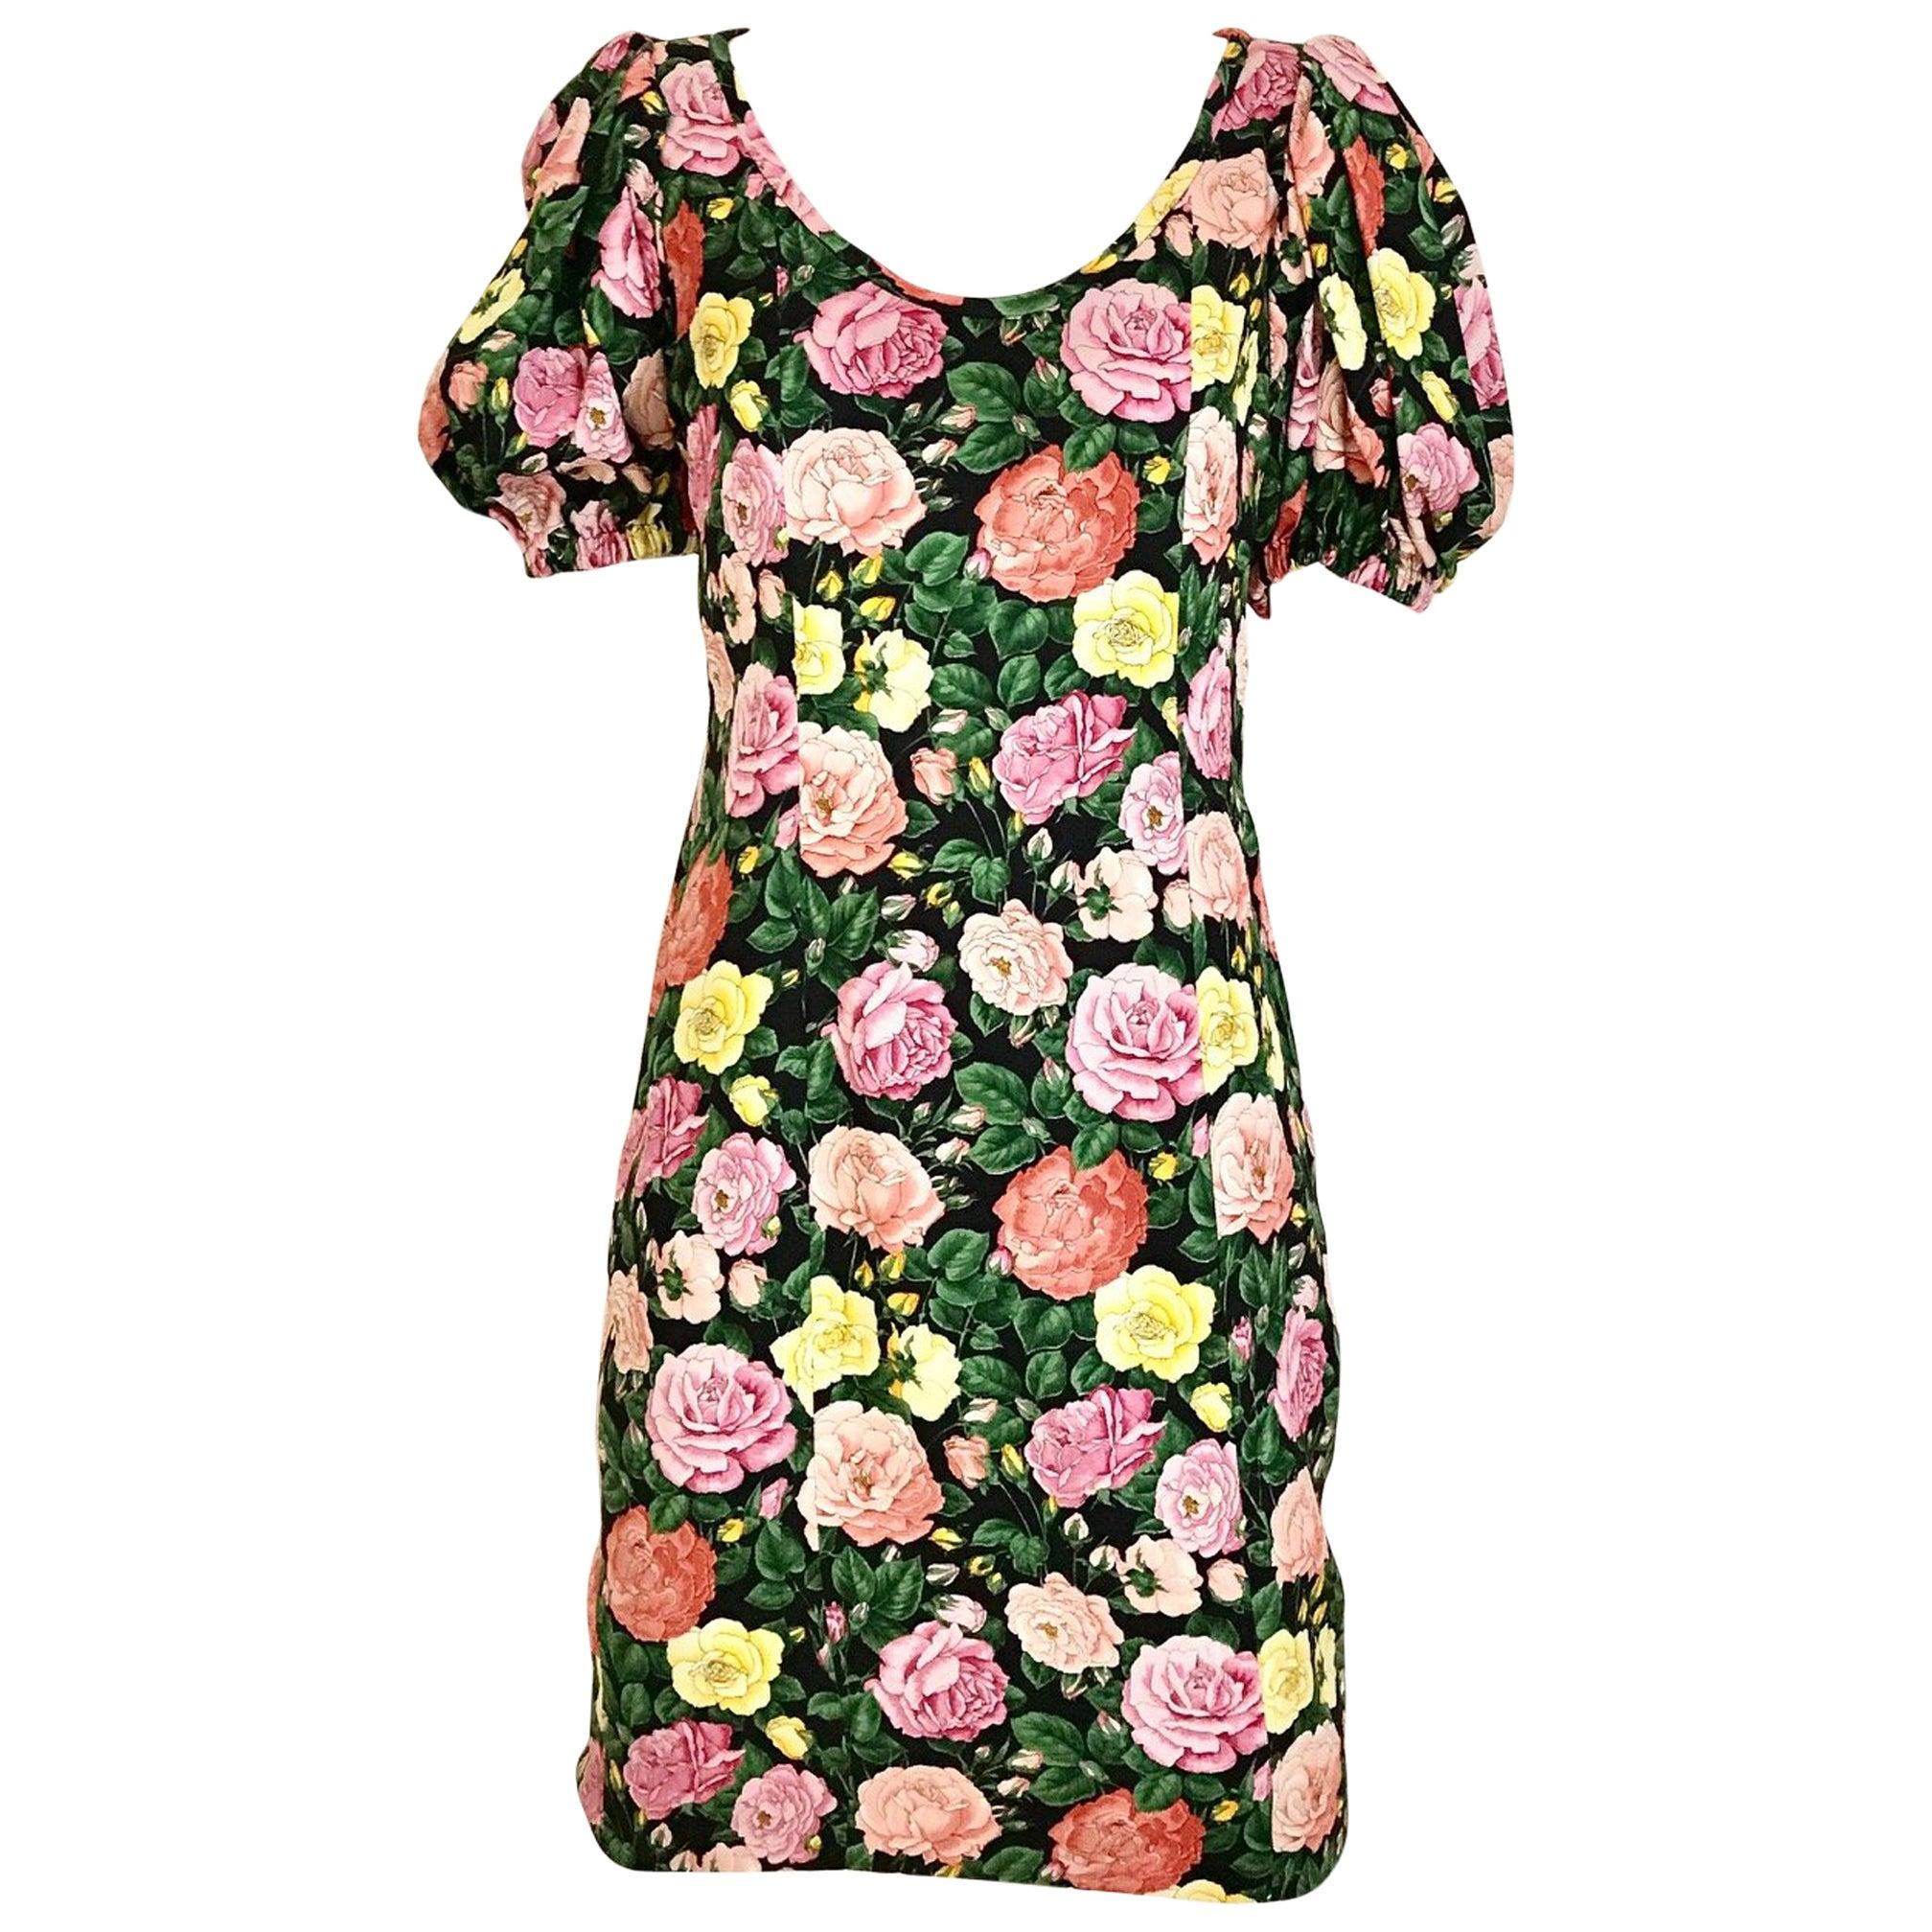 Vintage Yves Saint Laurent Floral Rose Print Cocktail Dress